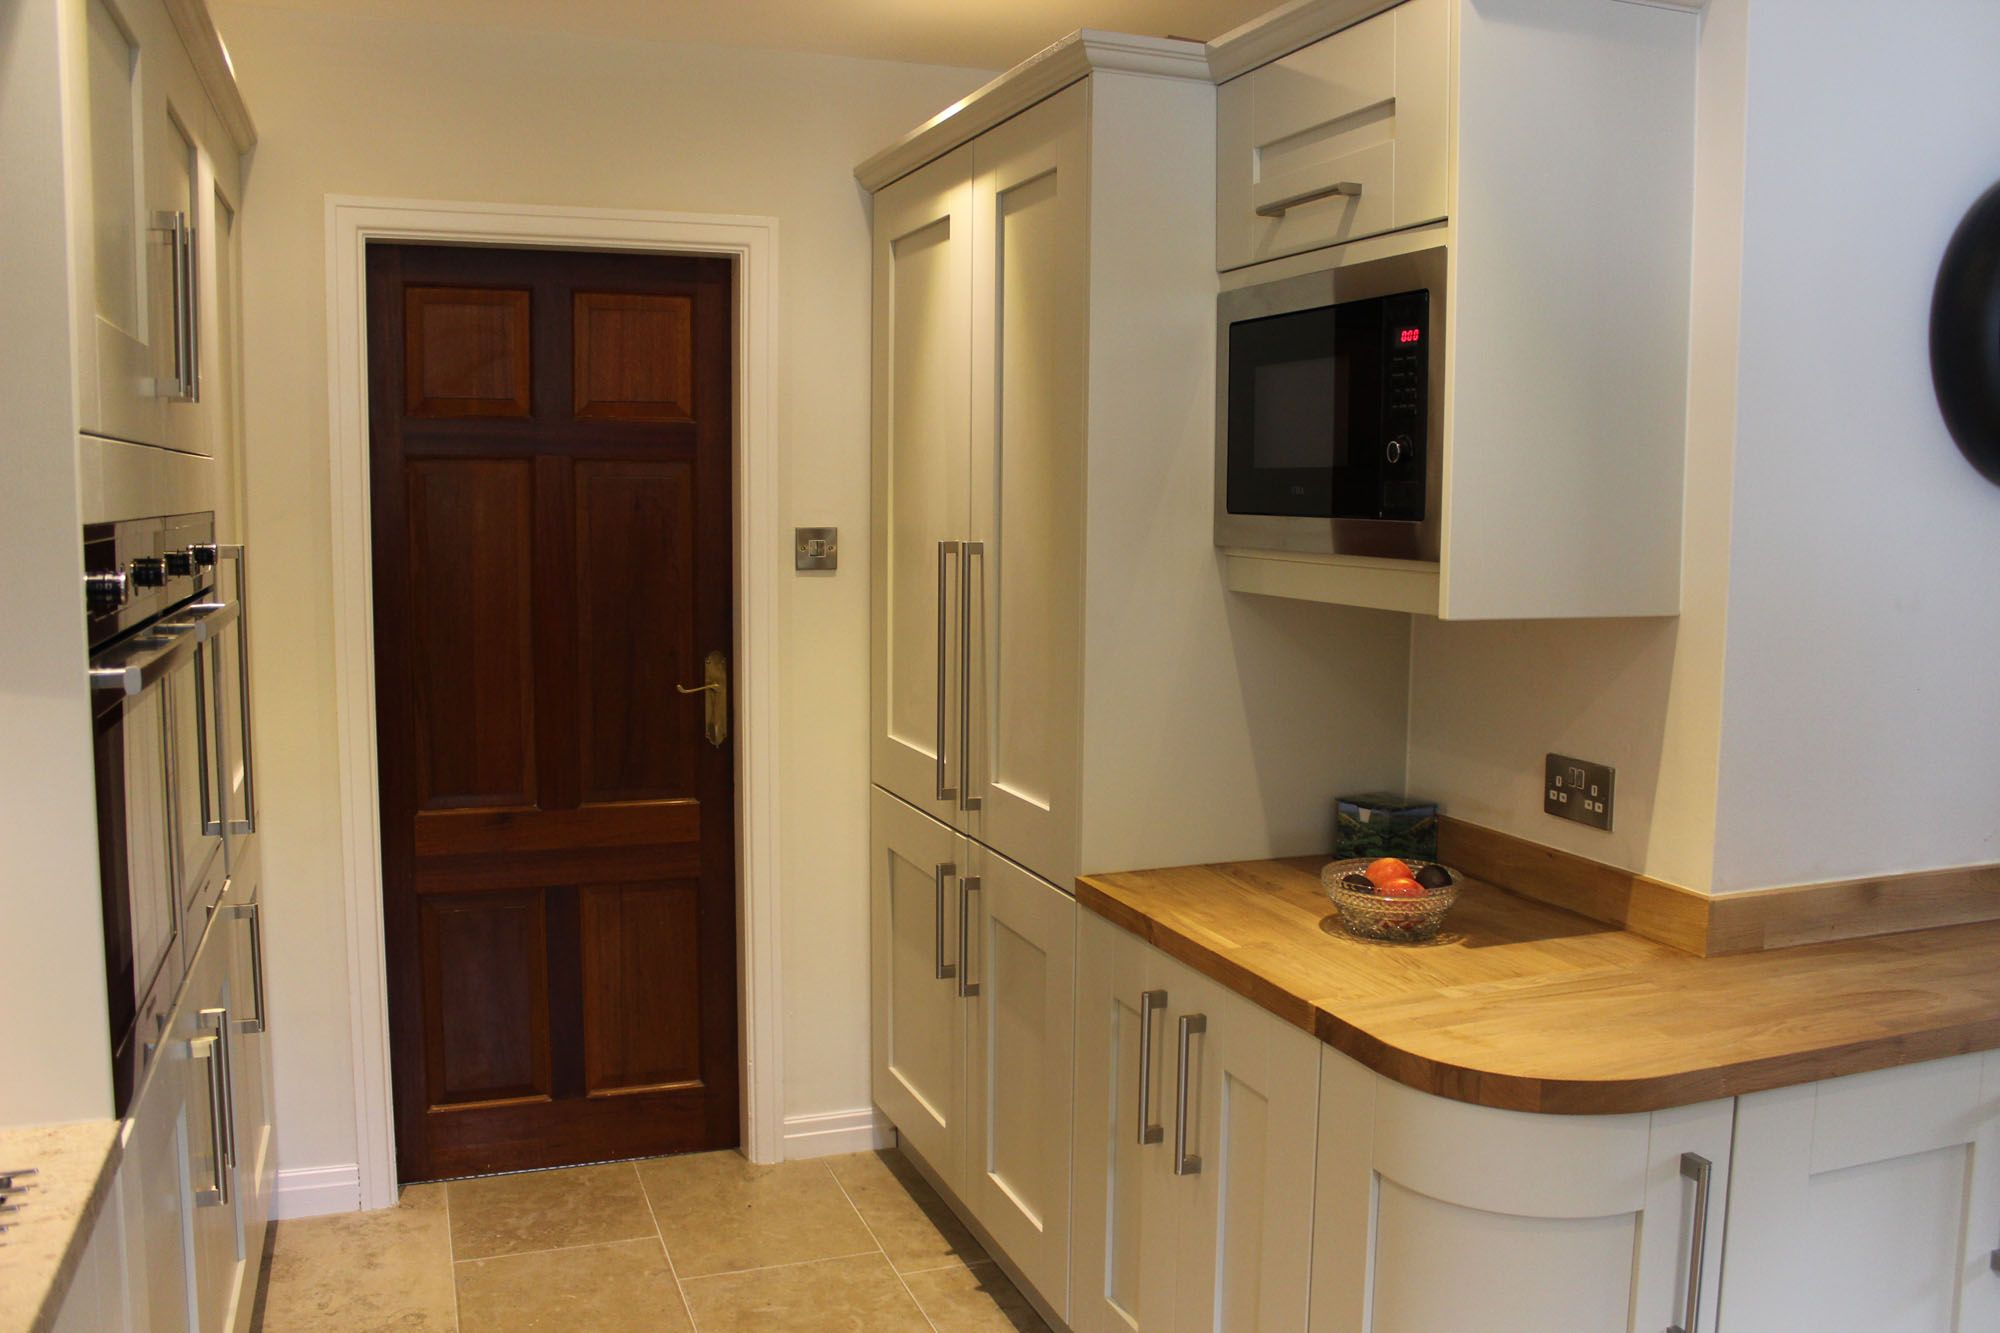 cheap kitchens discount kitchens for sale online cheap kitchen rh pinterest com